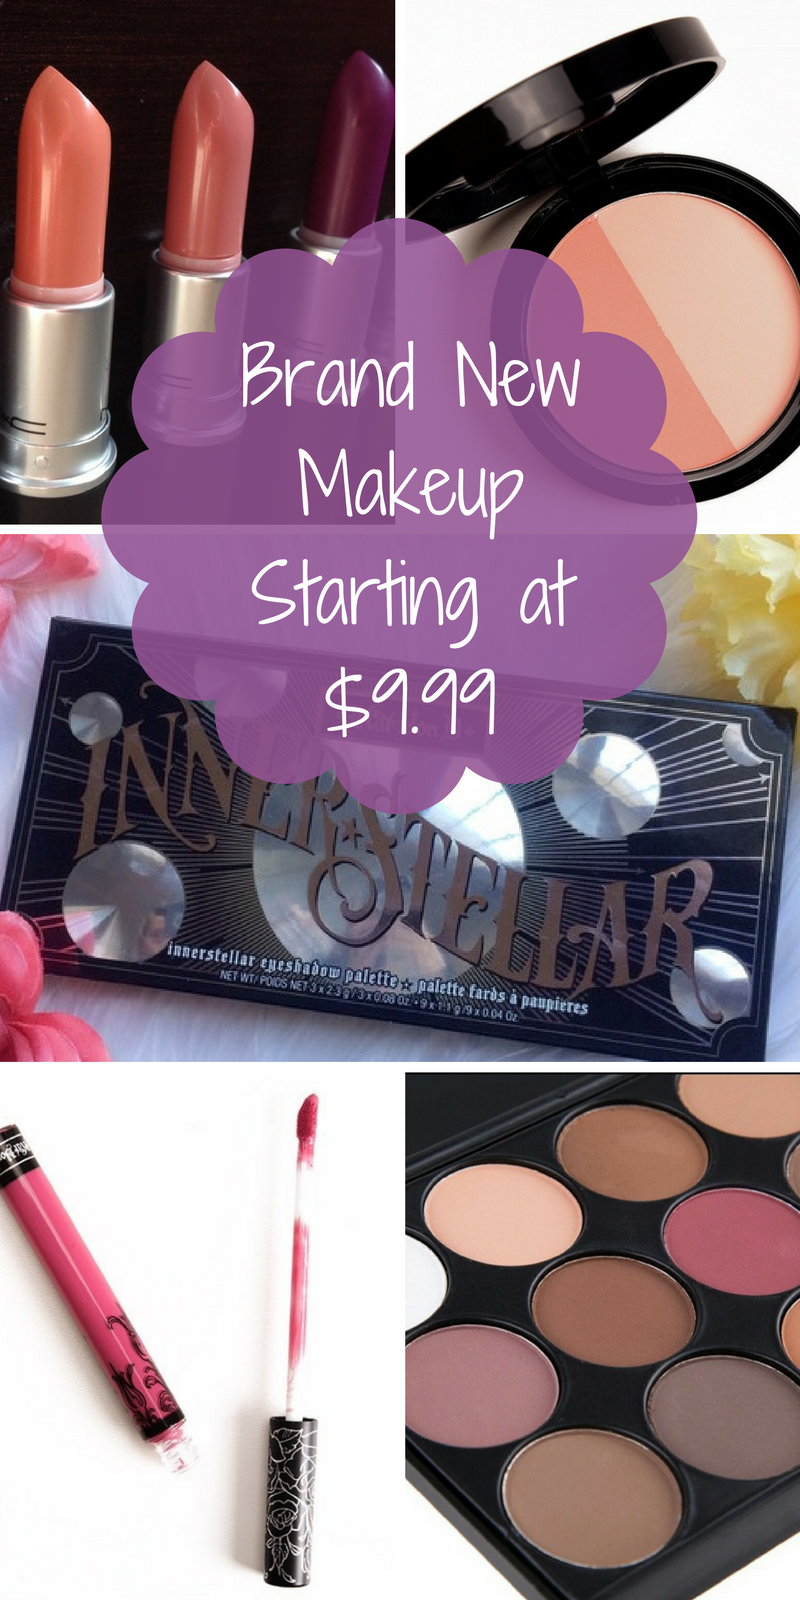 Sale! Shop brand new make up from brands like MAC, Kat Von